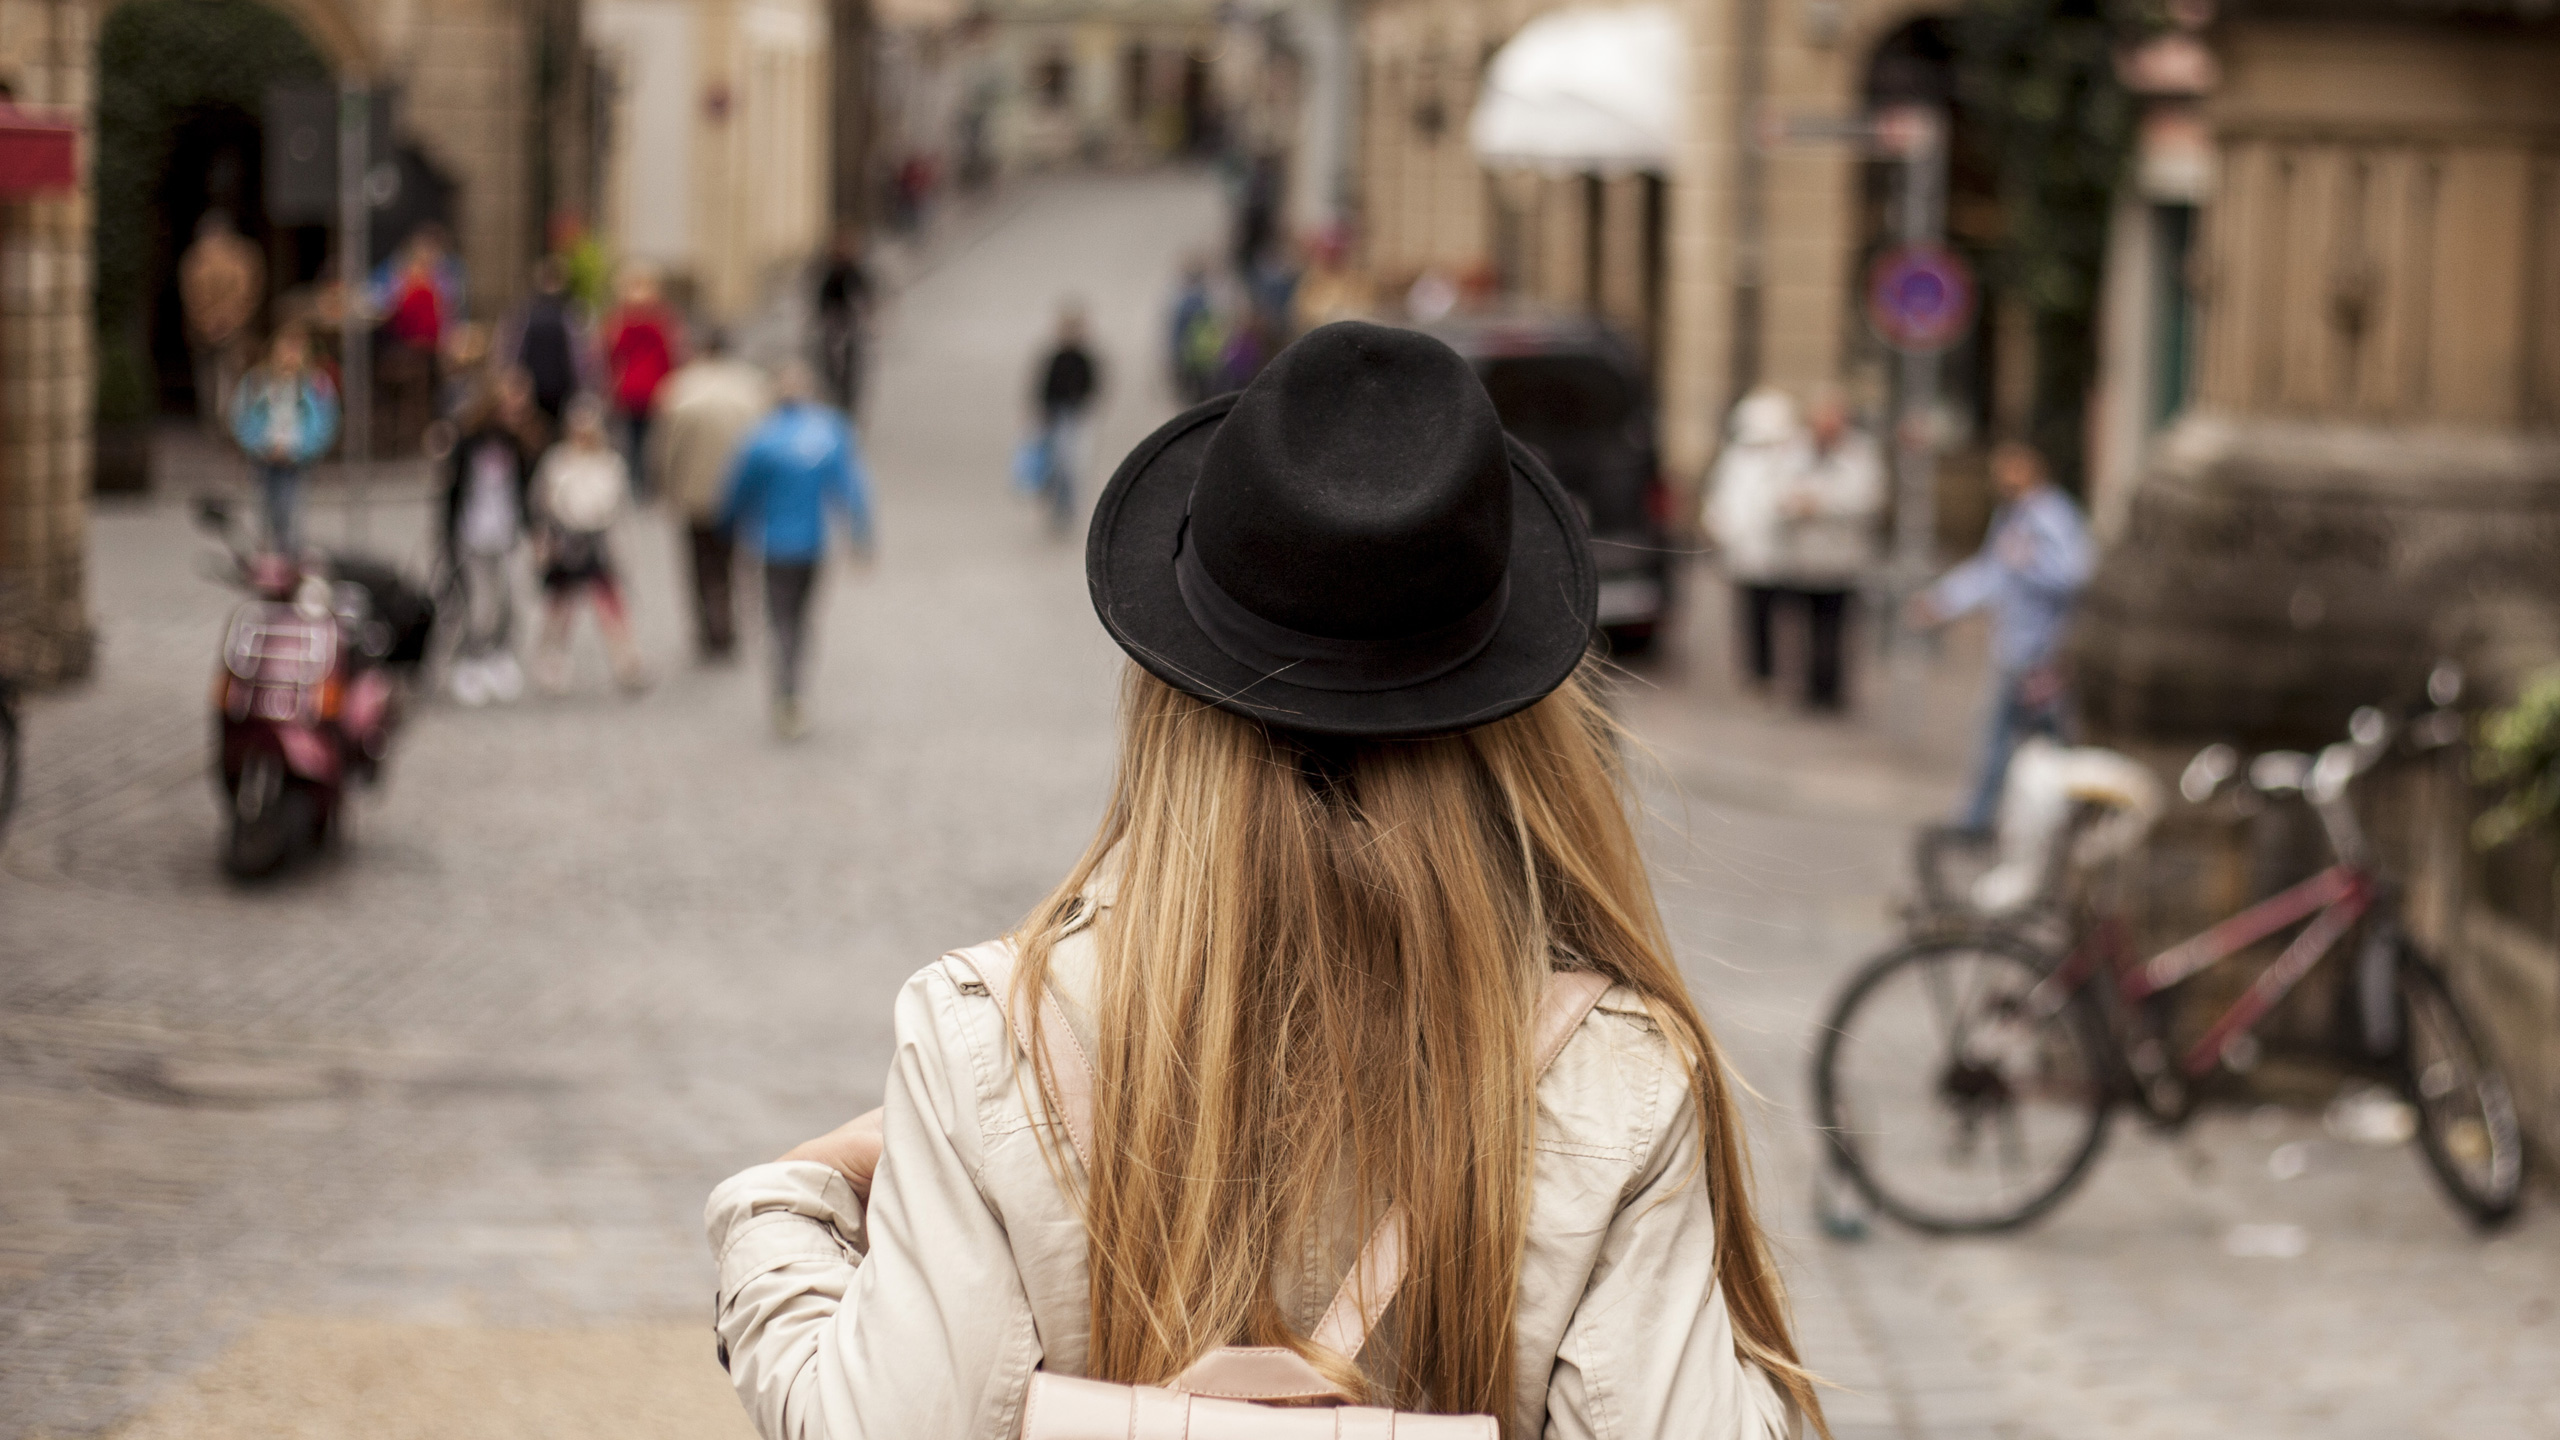 Entdecke versteckte Schönheiten Bambergs